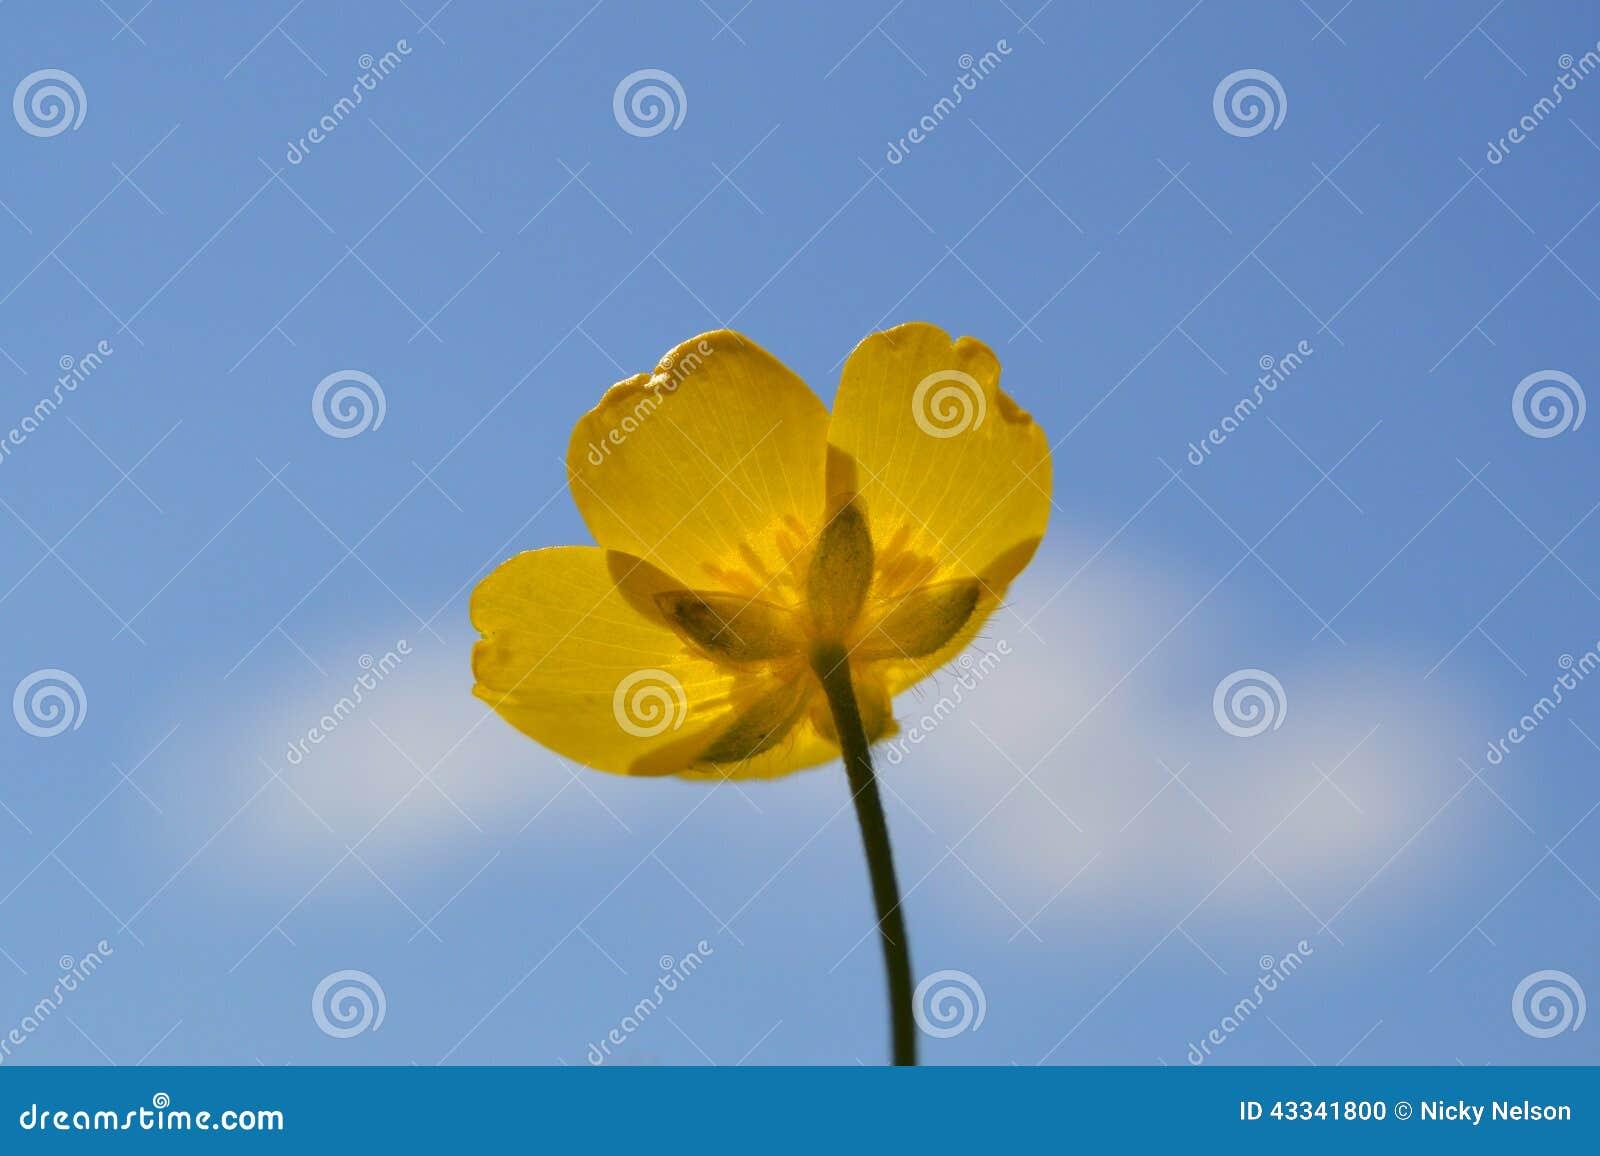 Gele Boterbloem tegen blauwe hemel